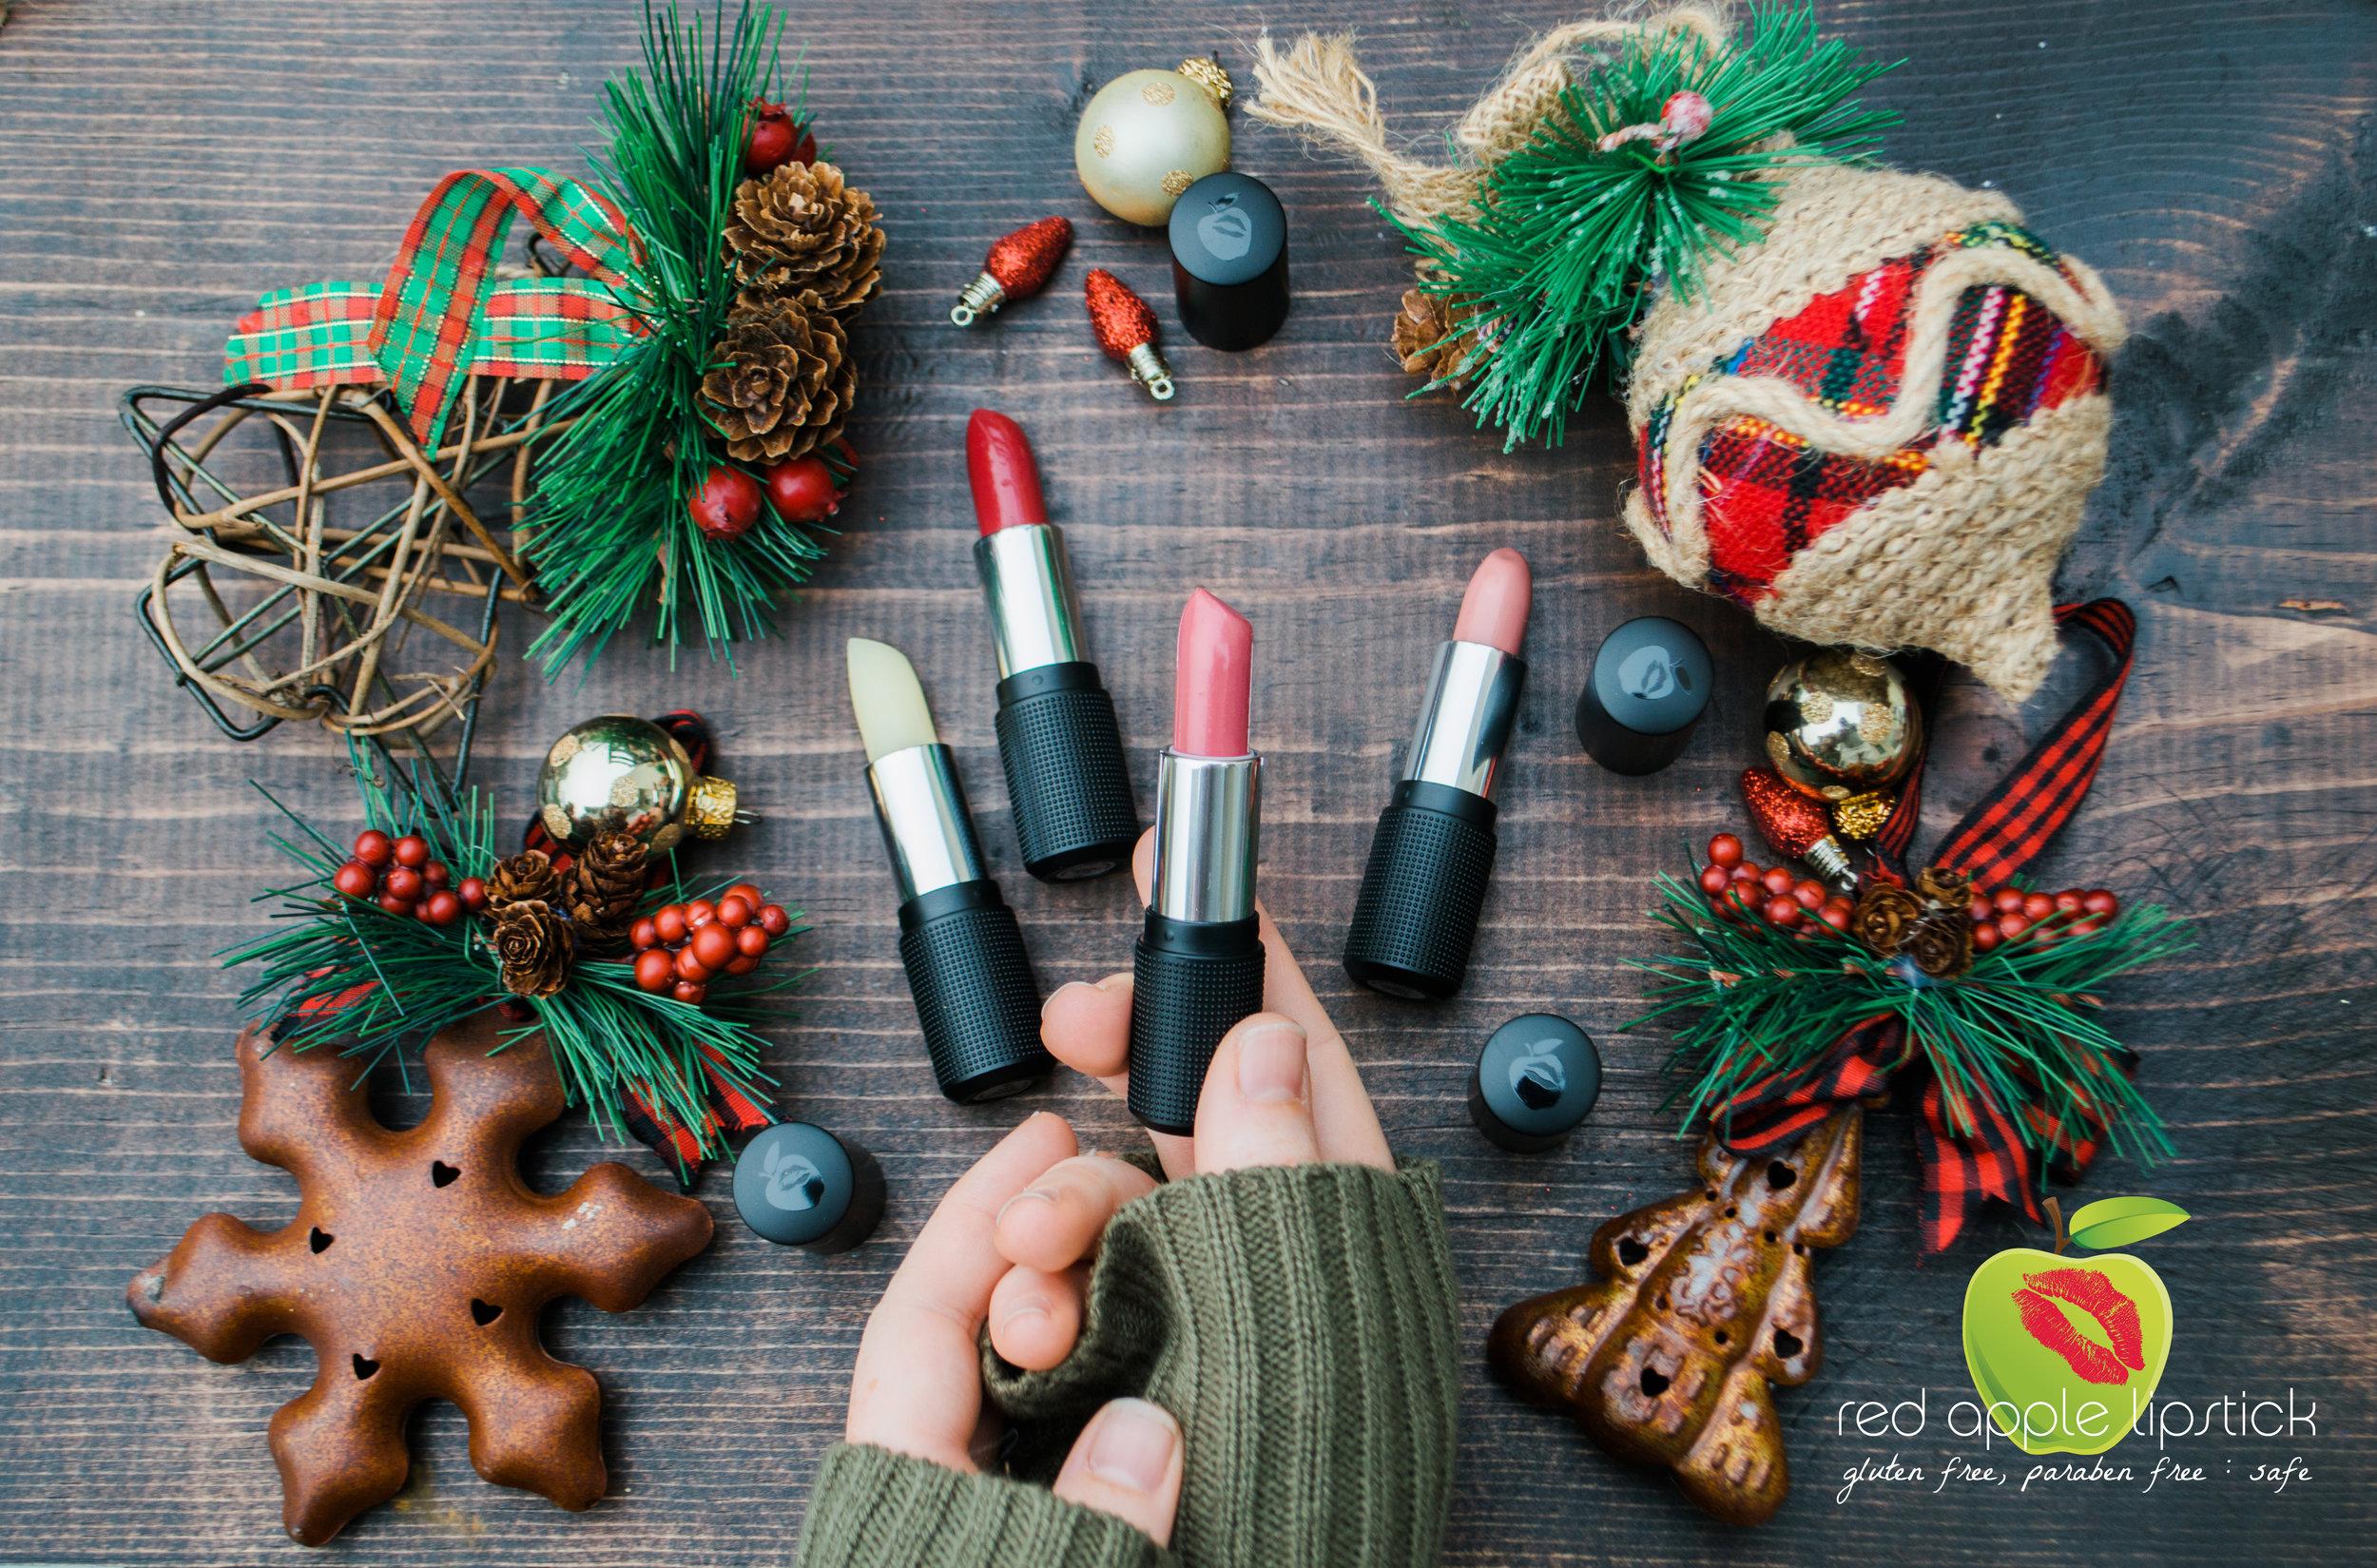 red_apple_lipstick